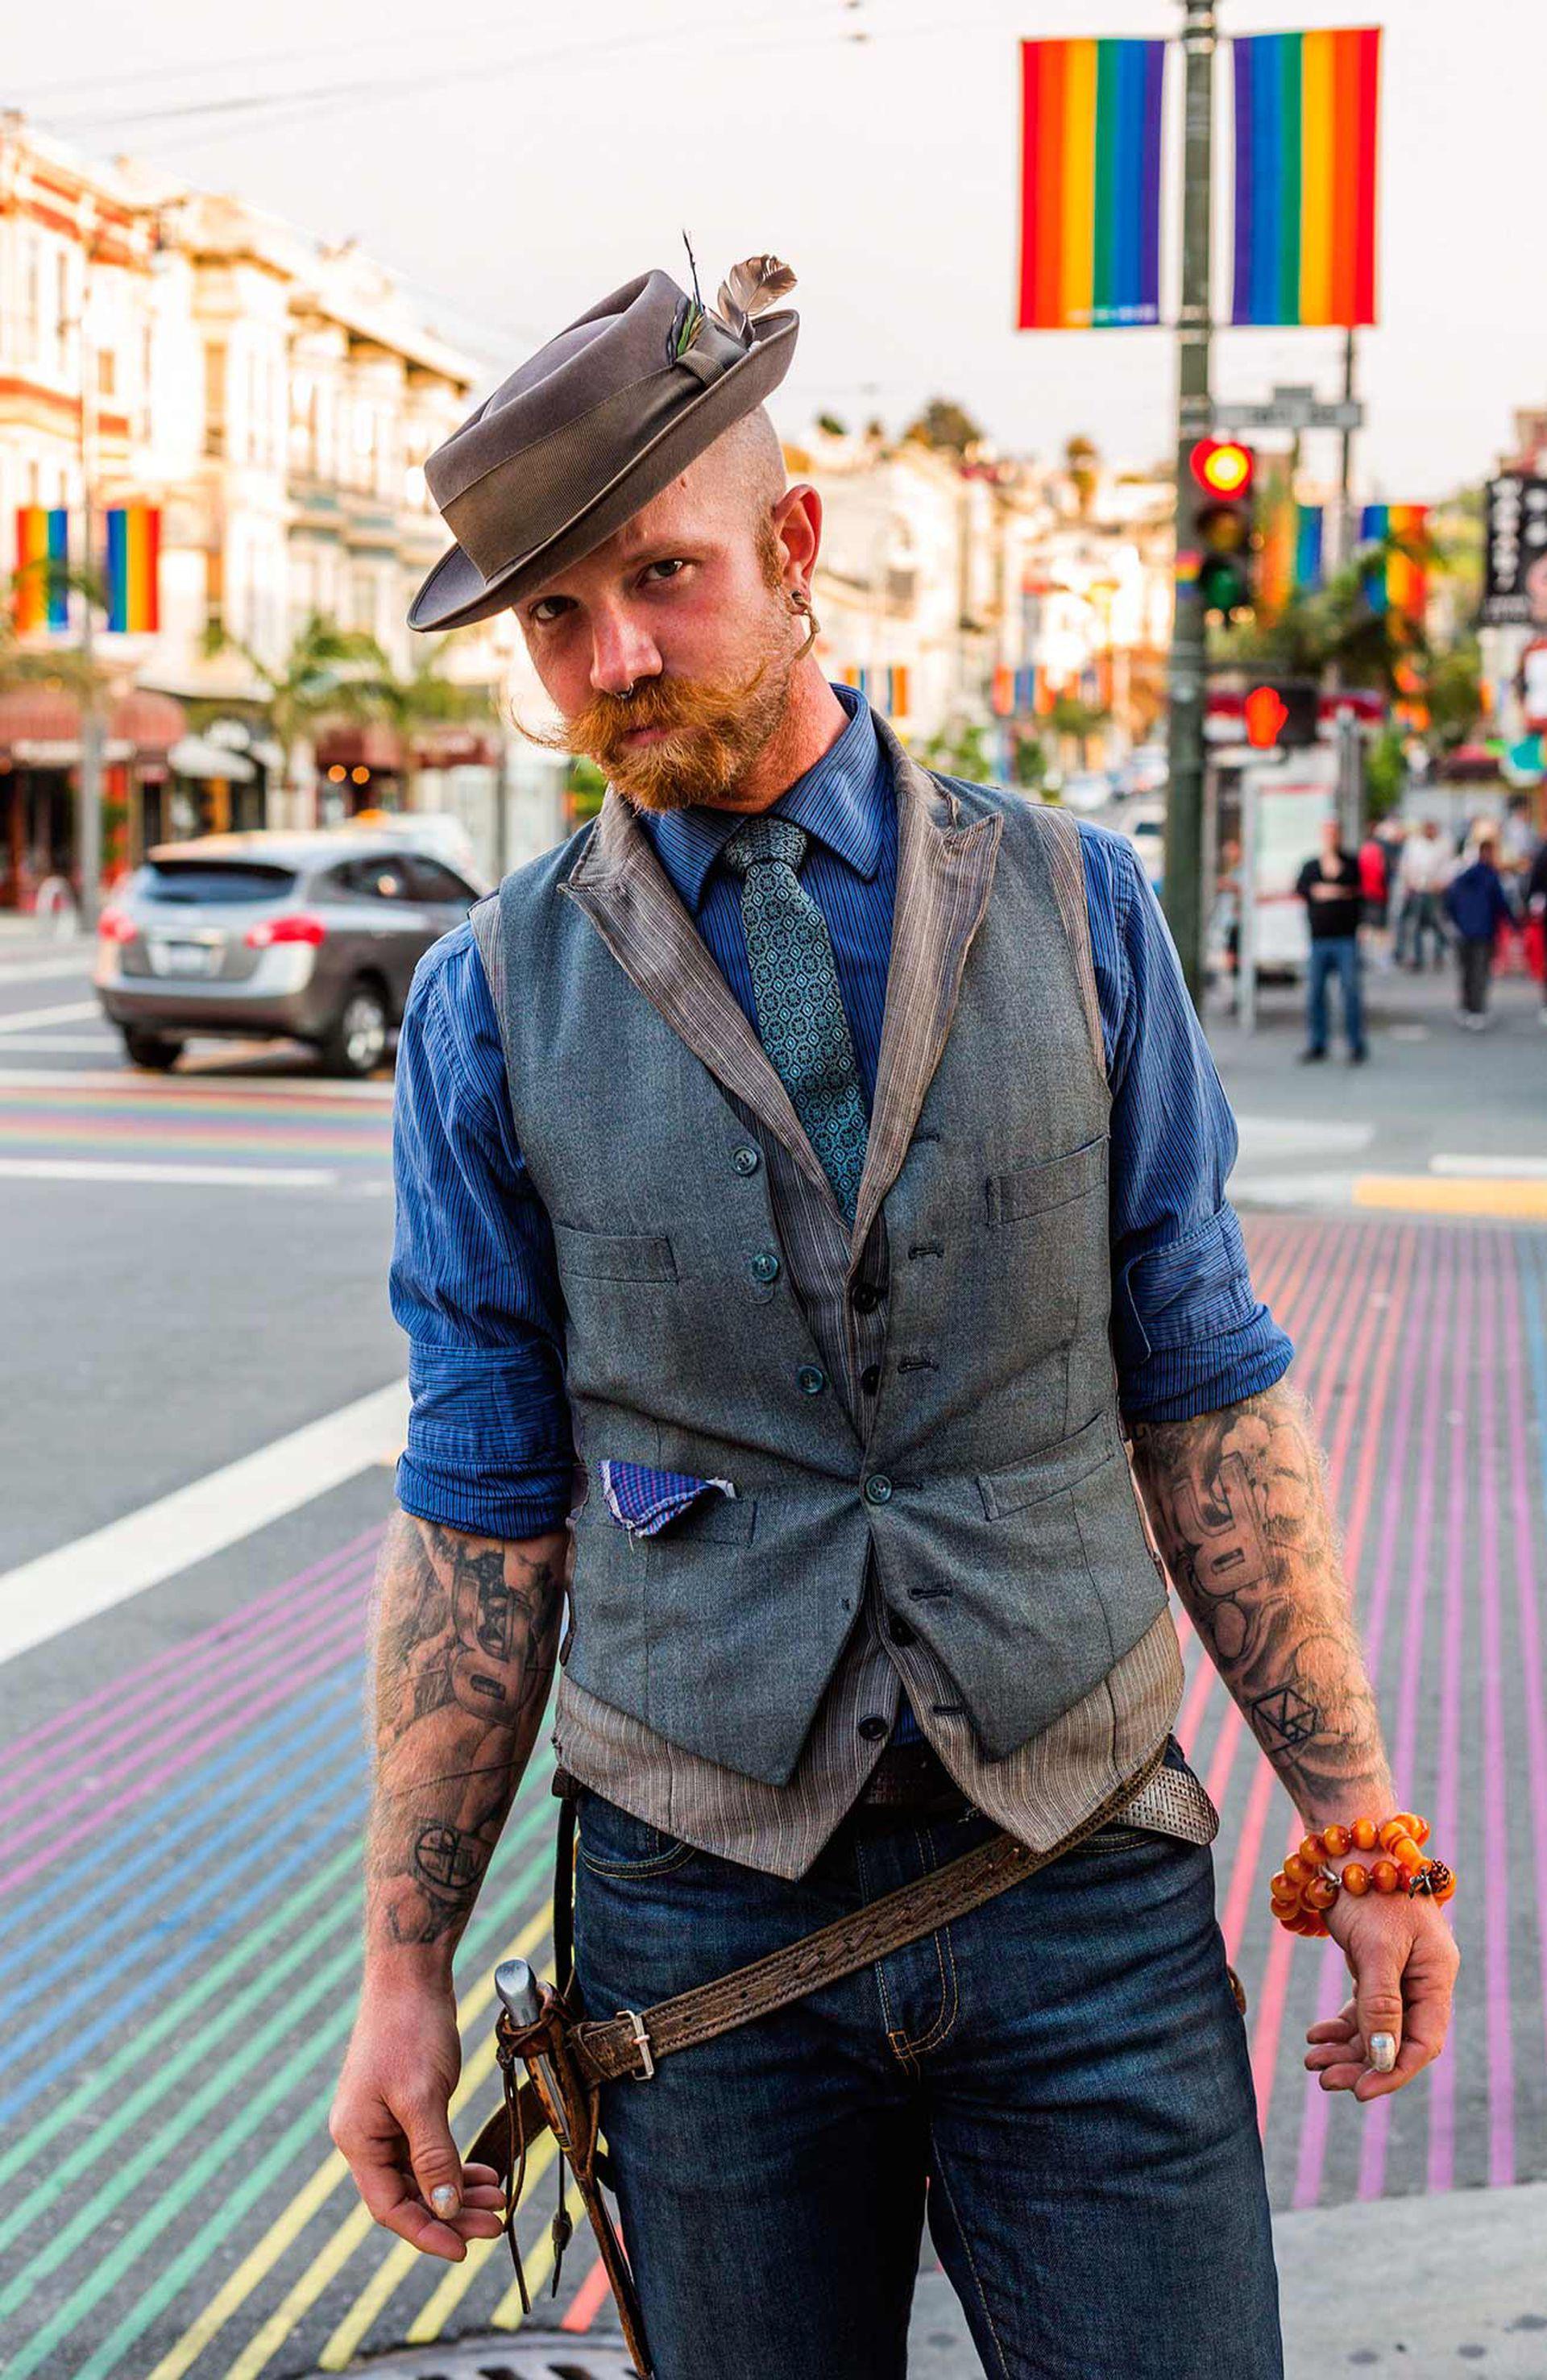 Residente de Castro, barrio gay que cobró fama a partir de la película Castro.